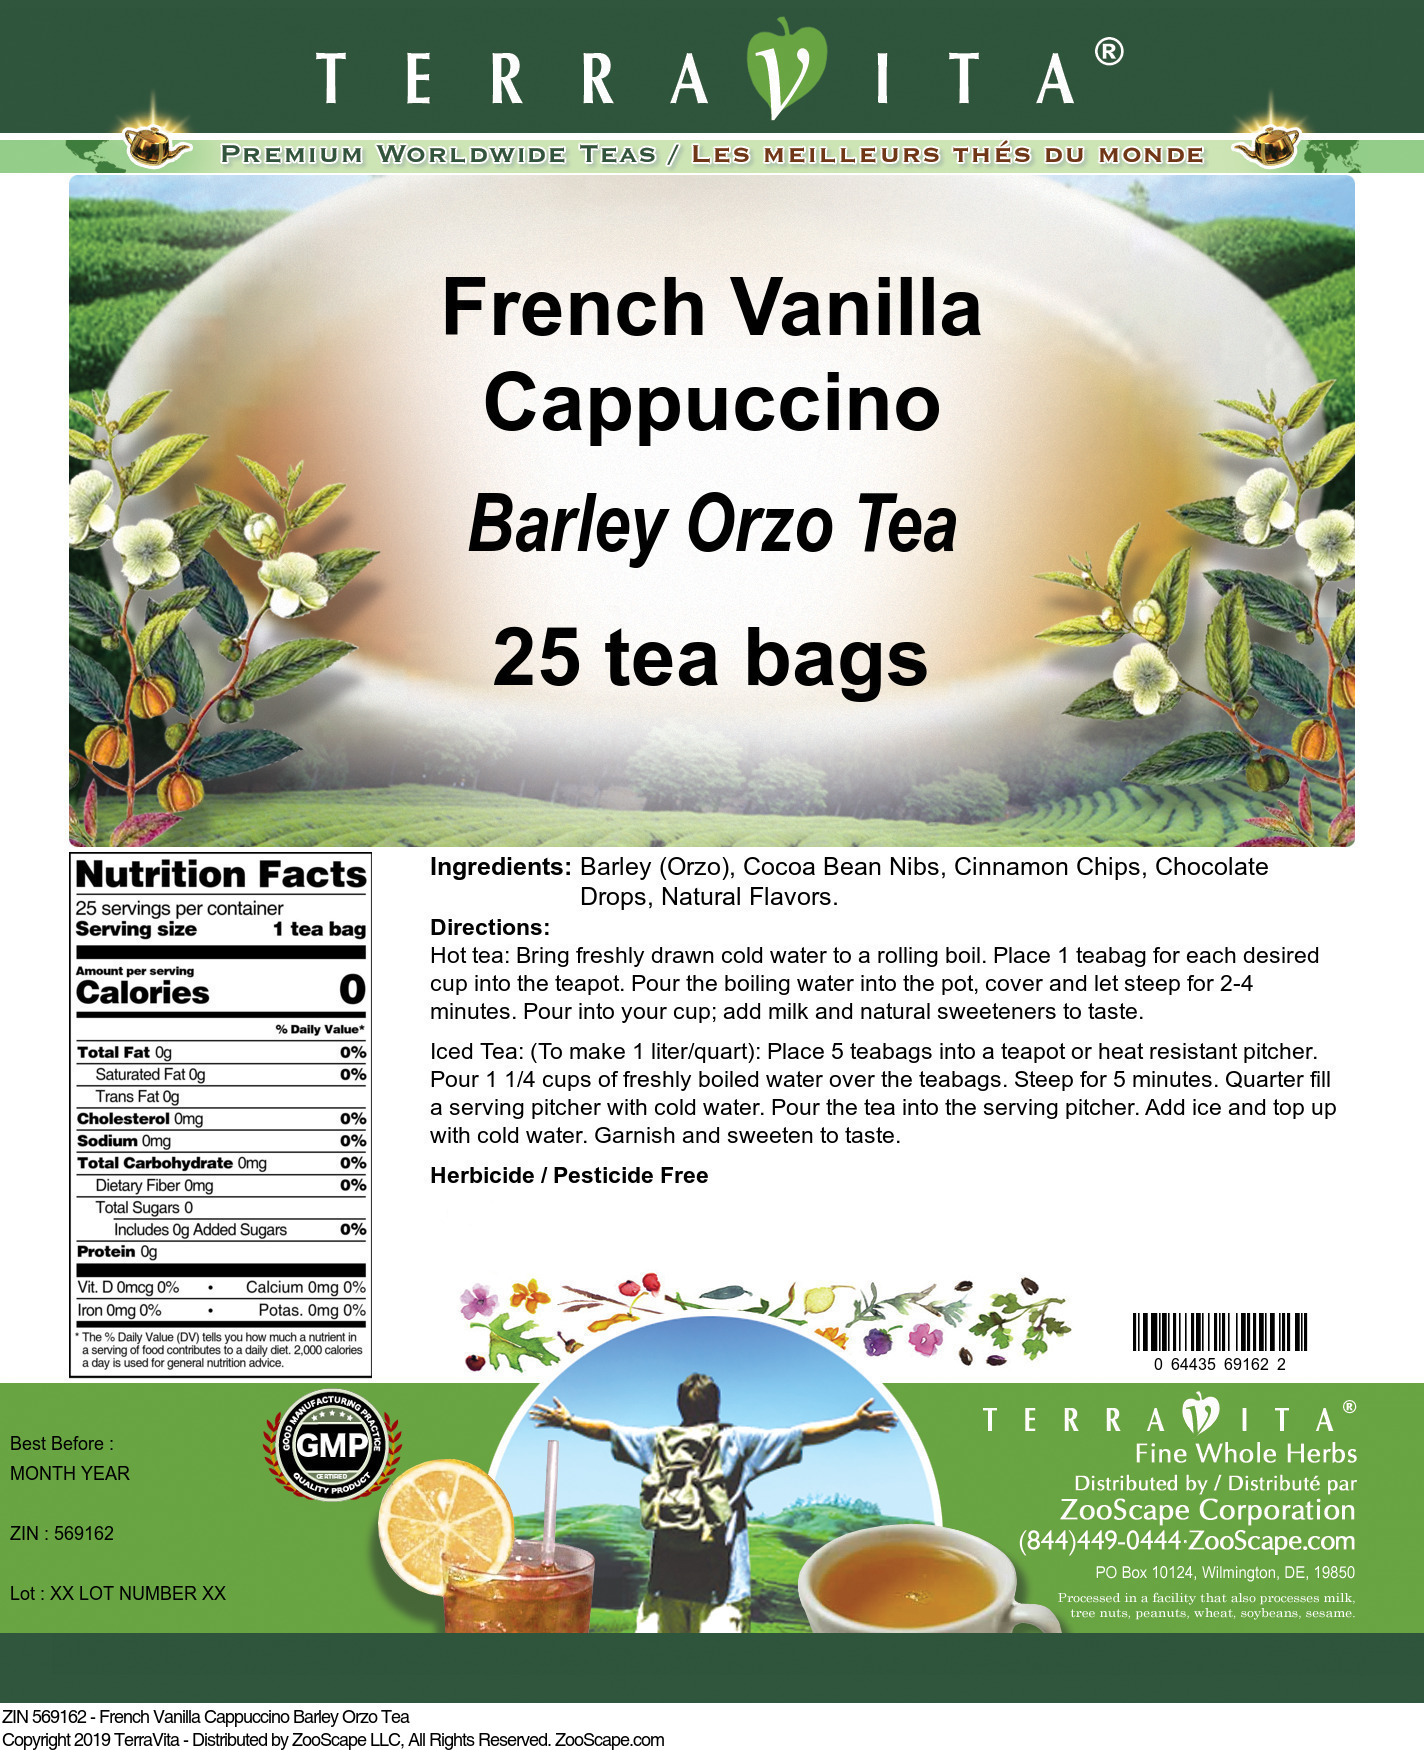 French Vanilla Cappuccino Barley Orzo Tea